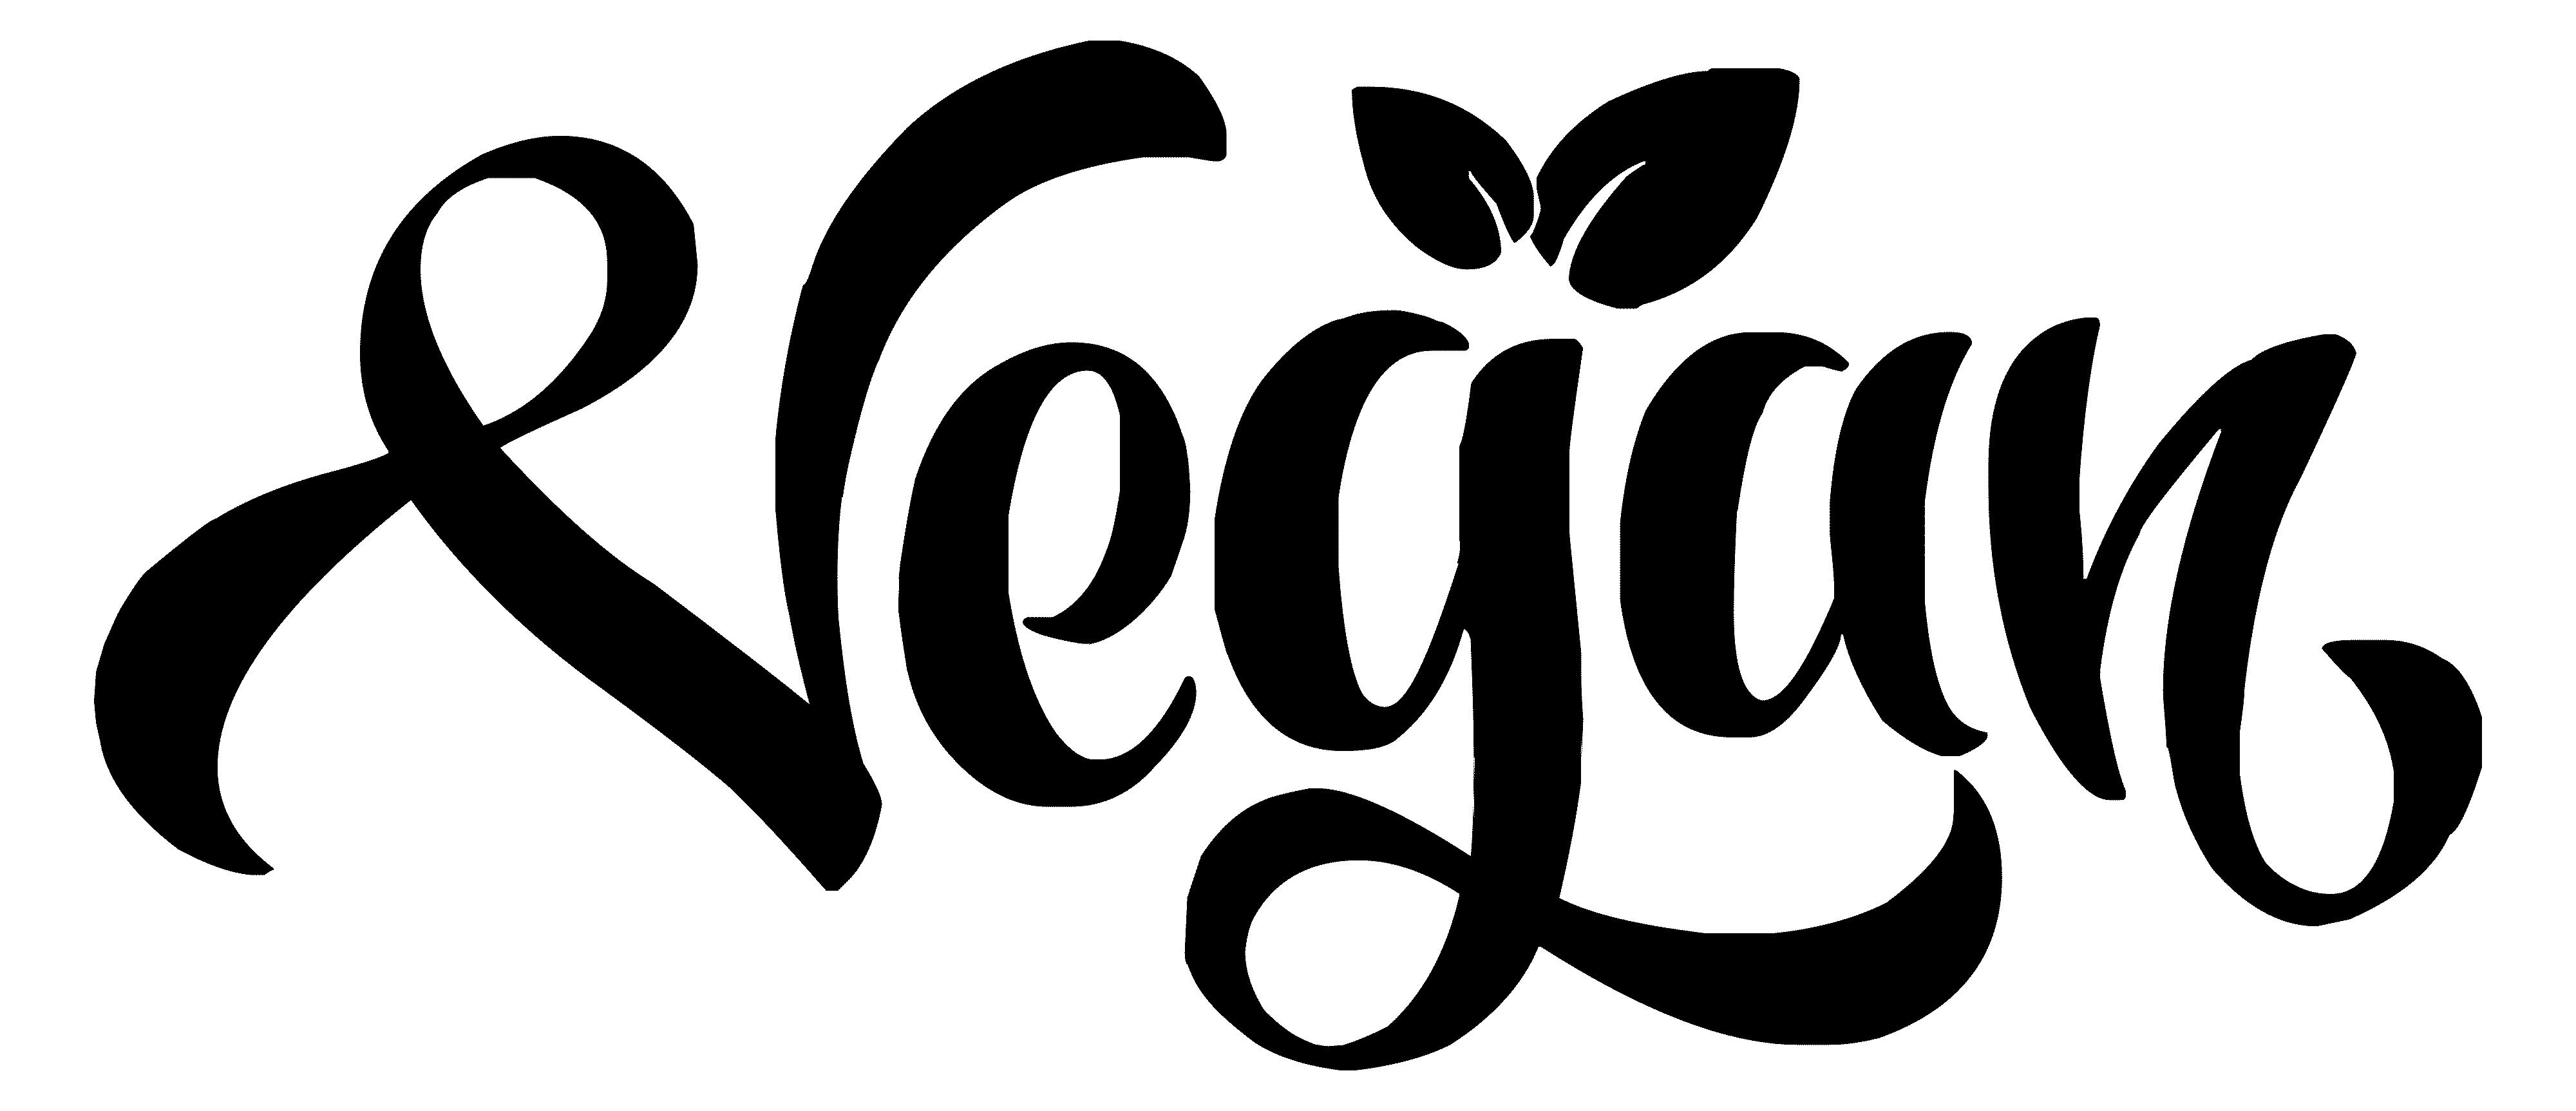 vegan symbol emojis copyright free clipart copypaste transparent png image file 4000x1725 transparent png buycottarizona